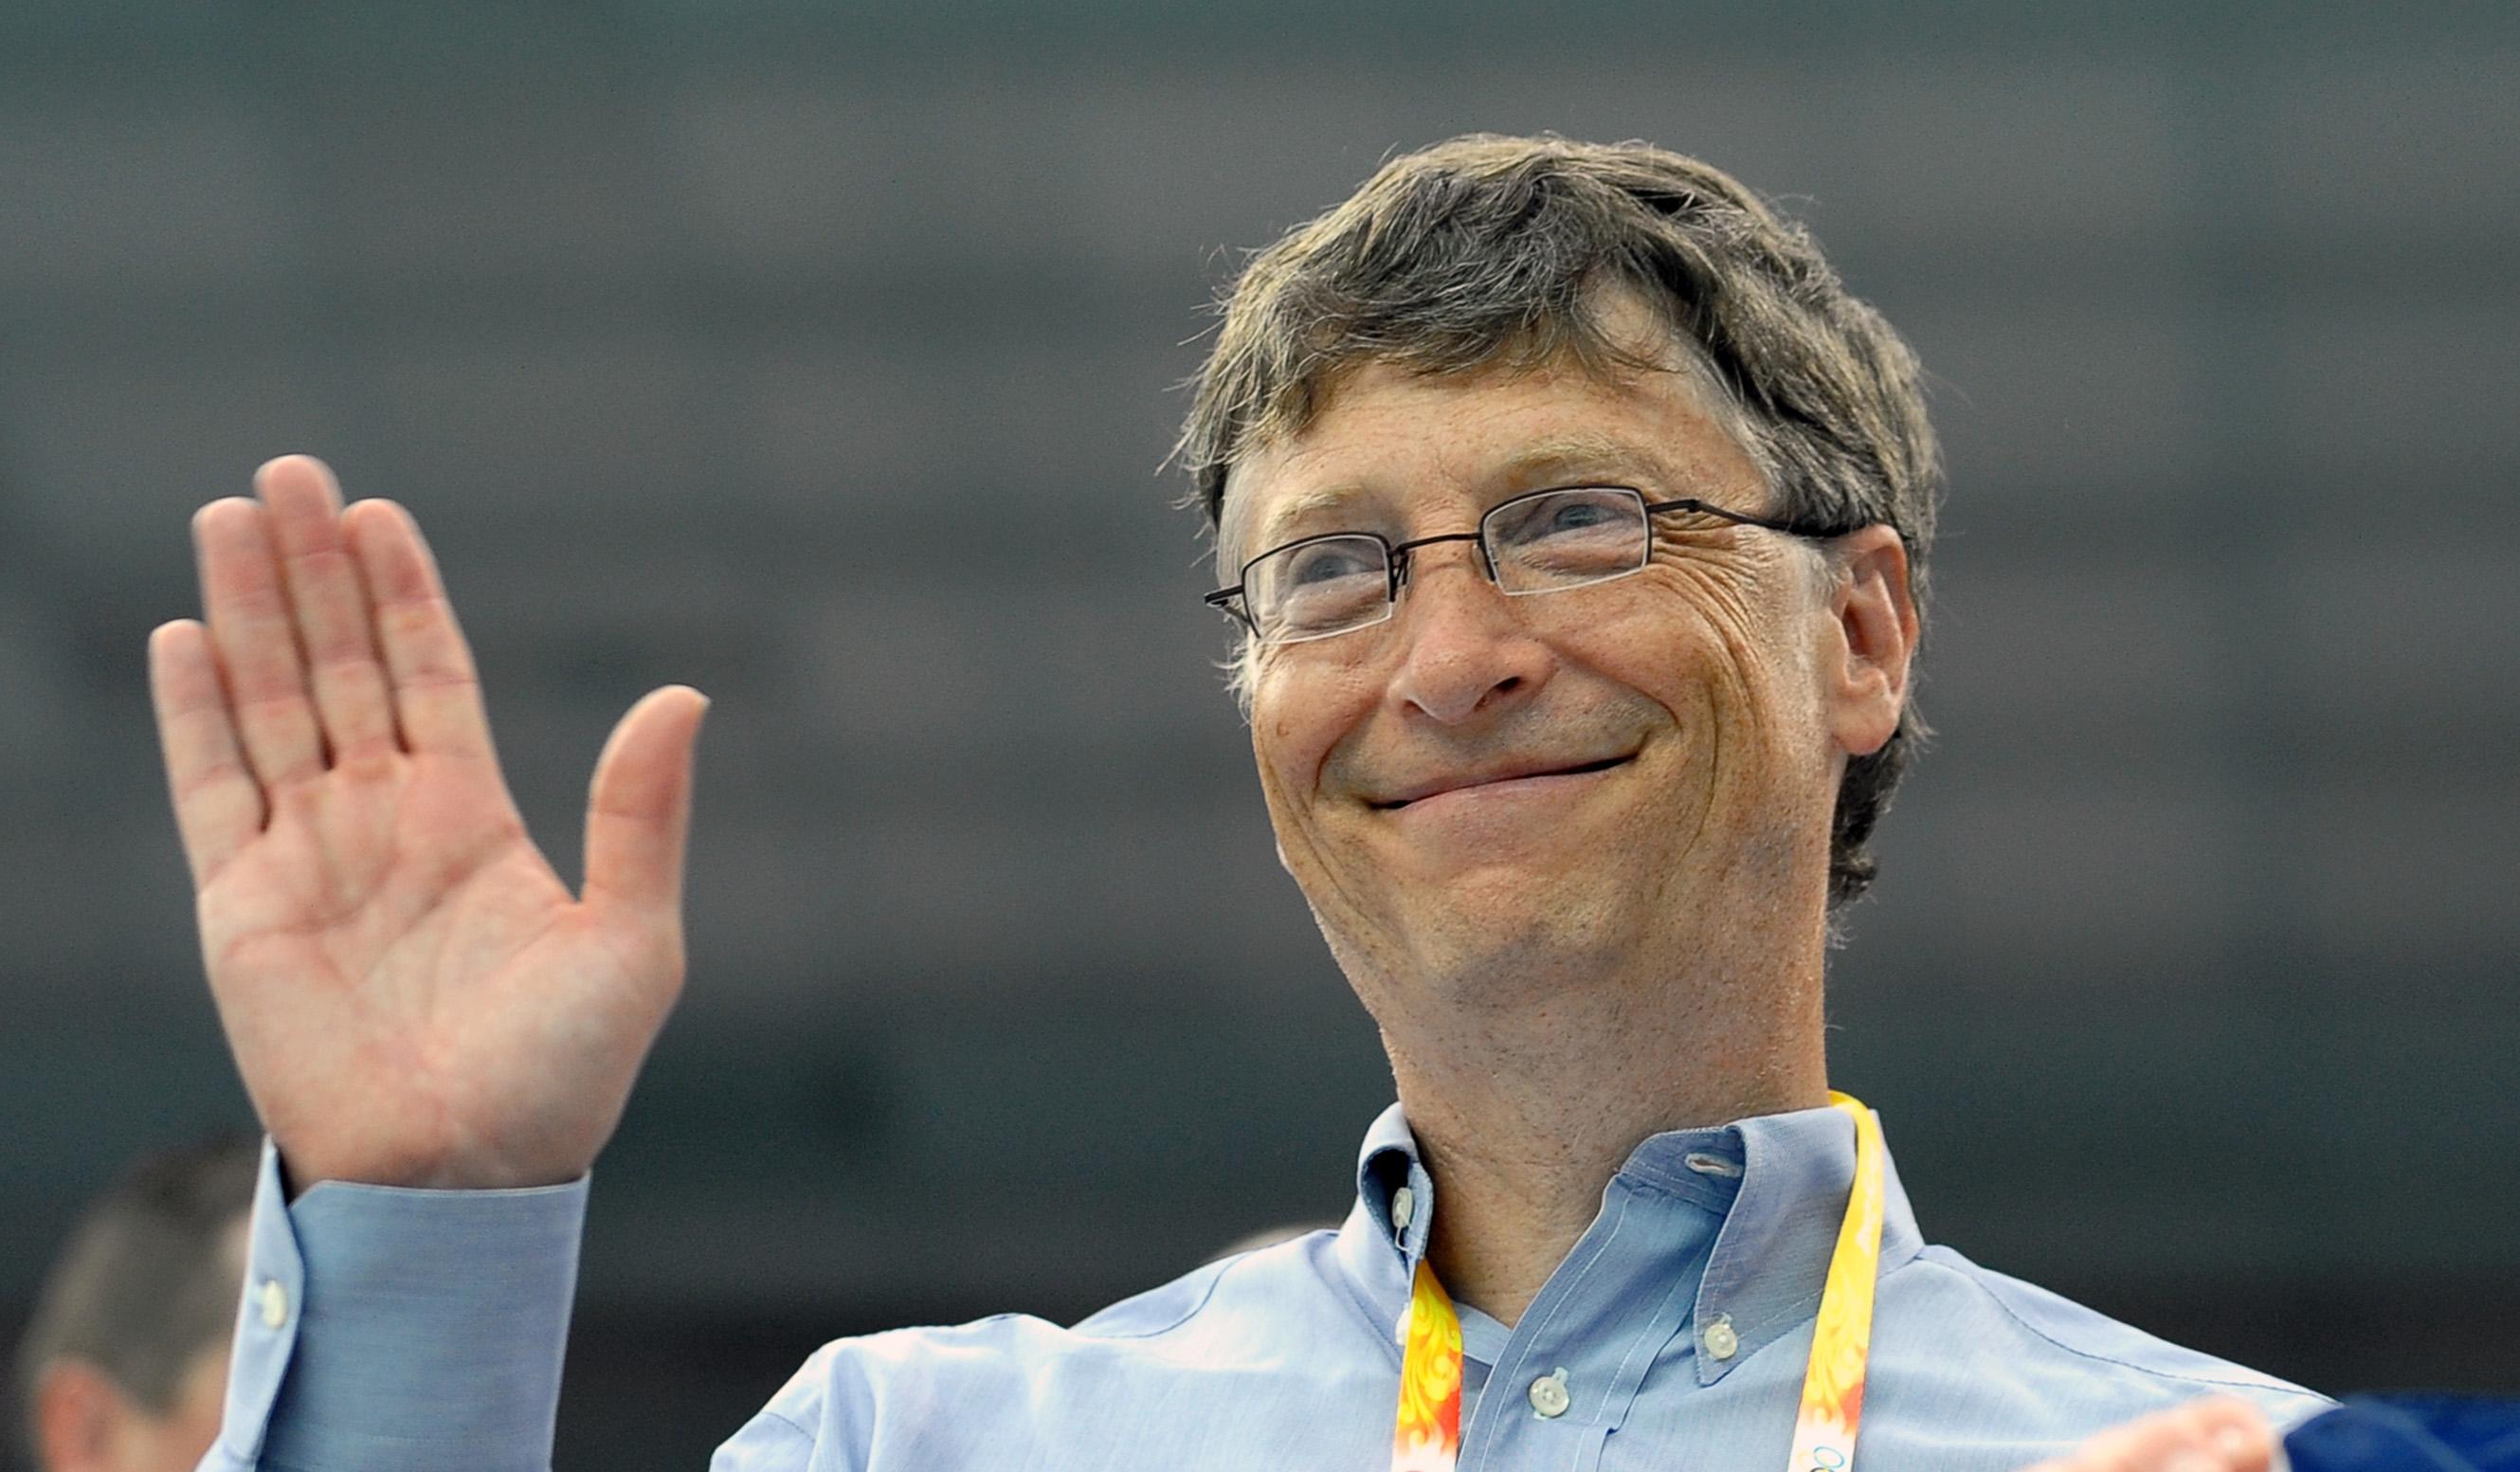 Билл Гейтс, США